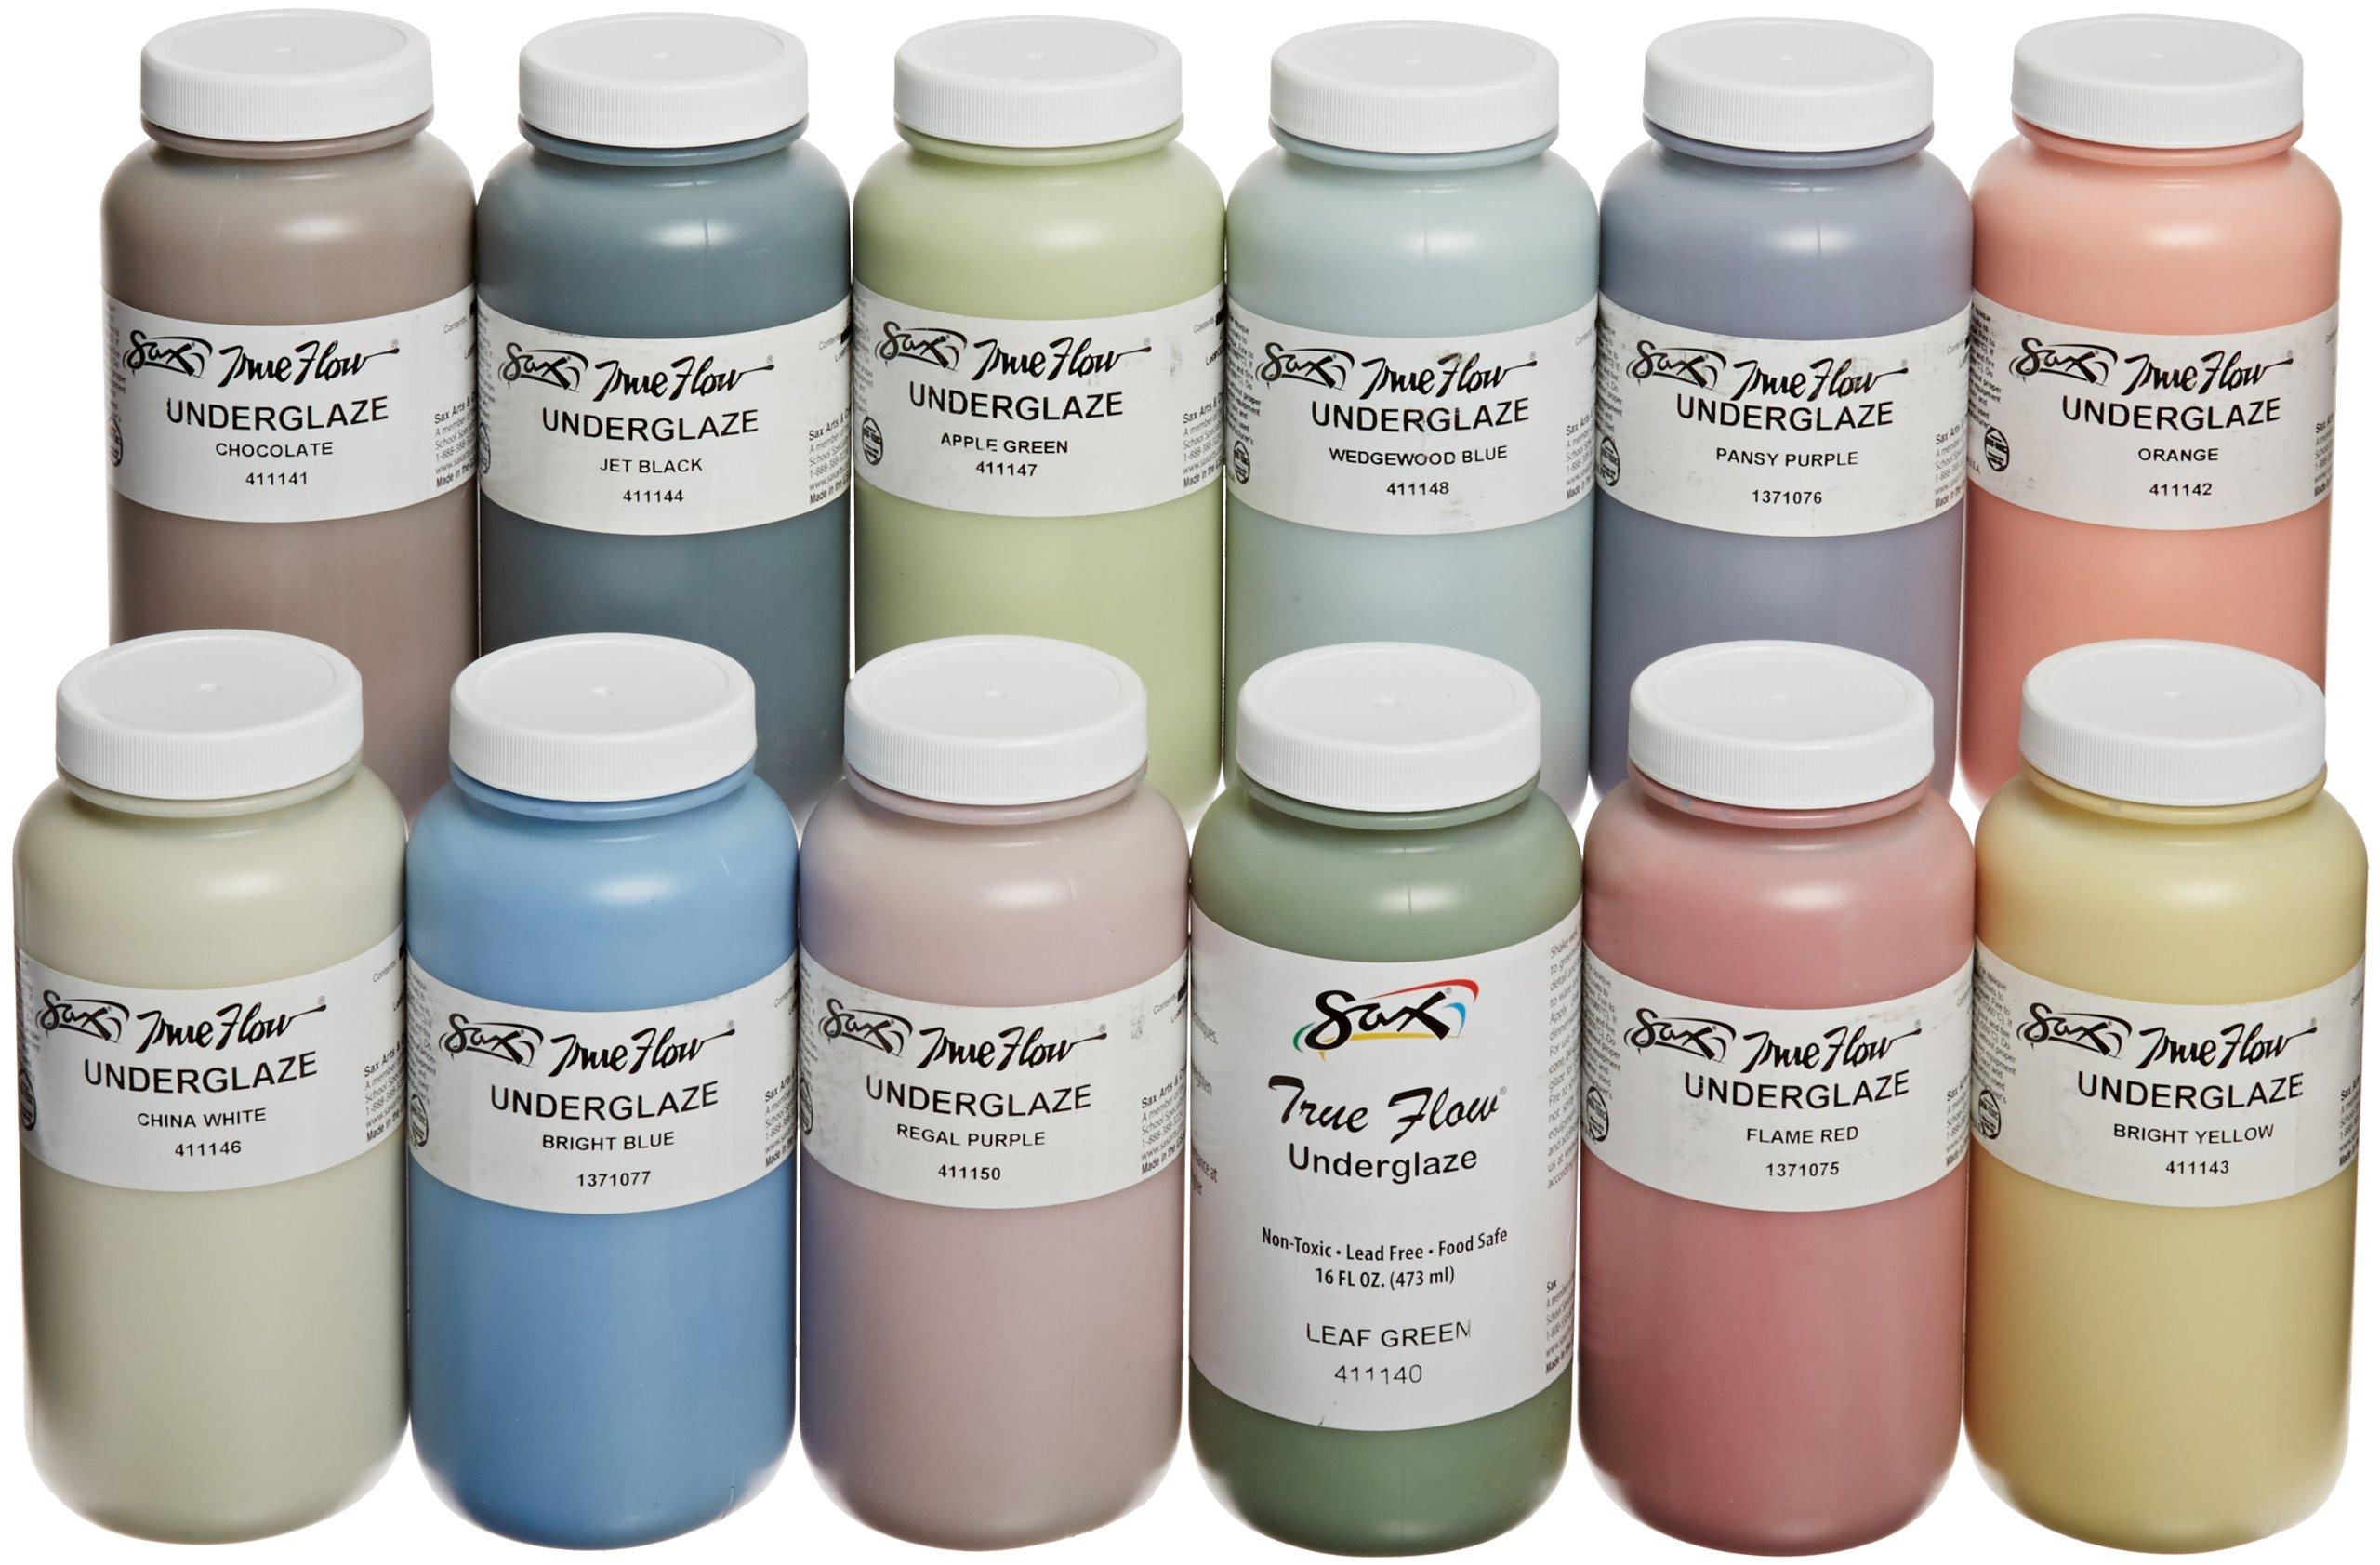 Sax True Flow Underglaze Set, Assorted Colors, Set of 12 Pints - 1371408